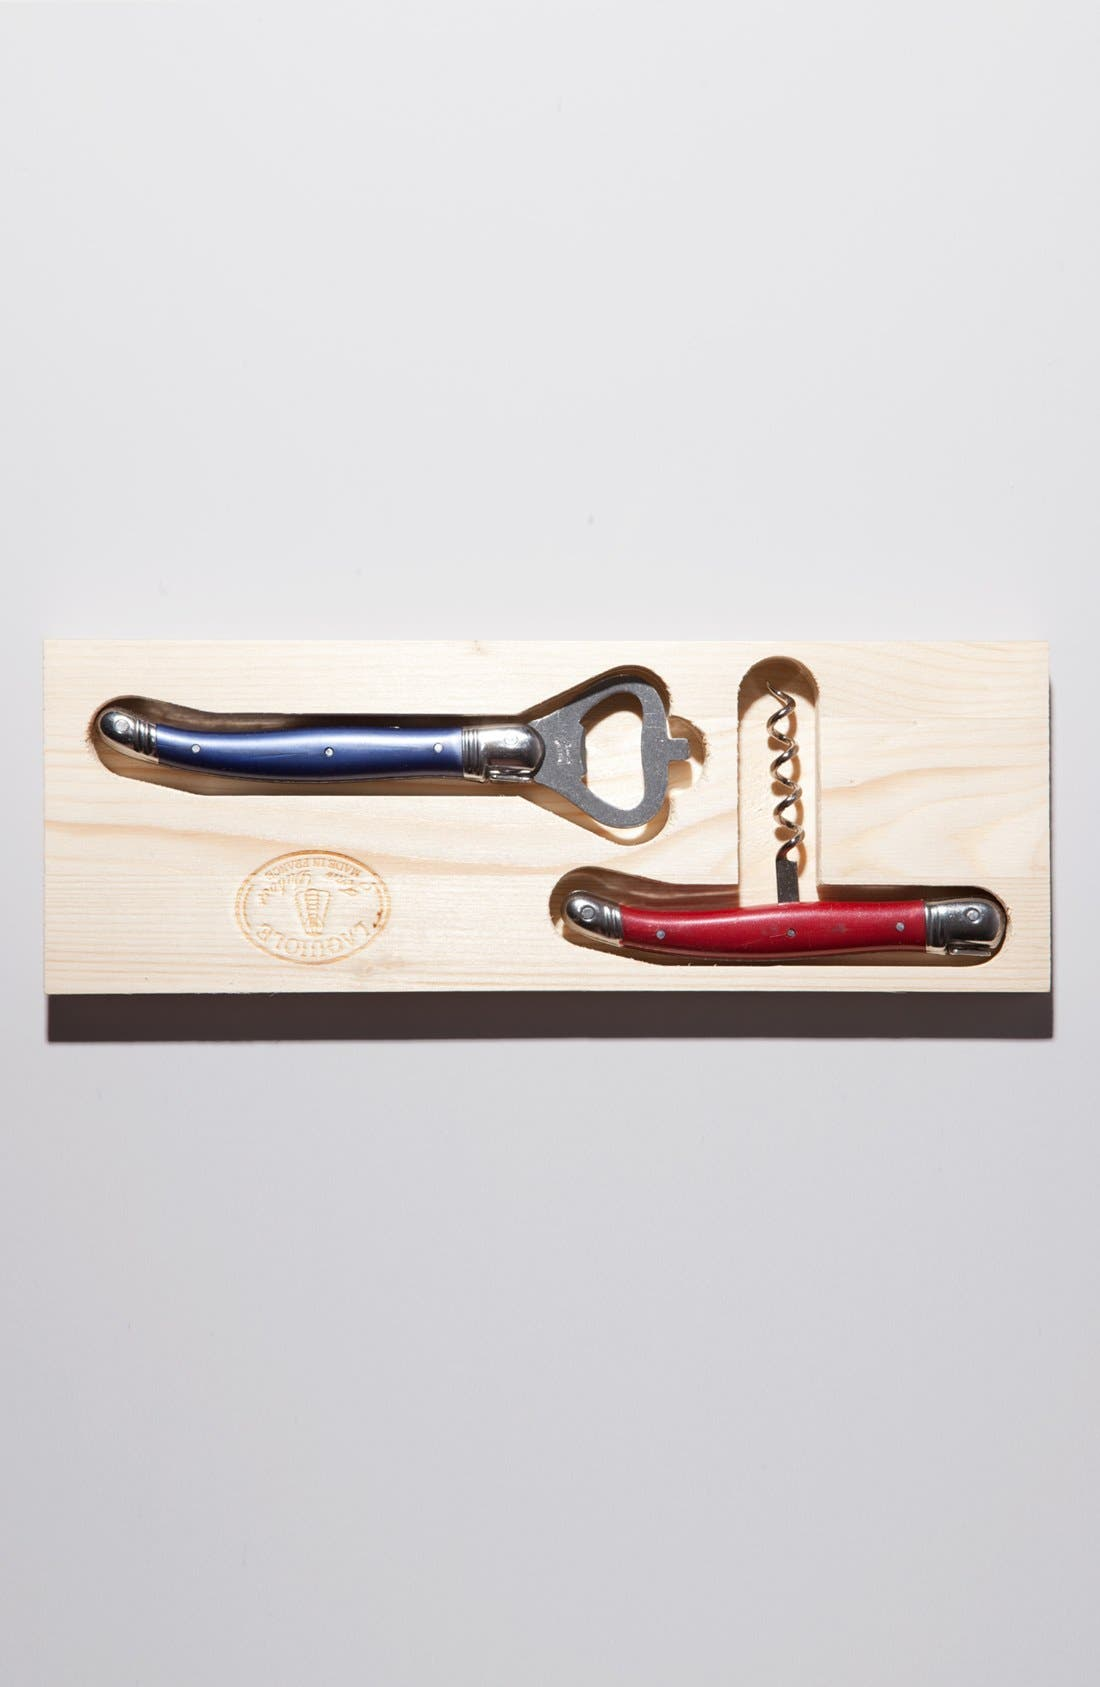 Alternate Image 2 Selected - Laguiole by Jean Dubost Corkscrew & Bottle Opener Set